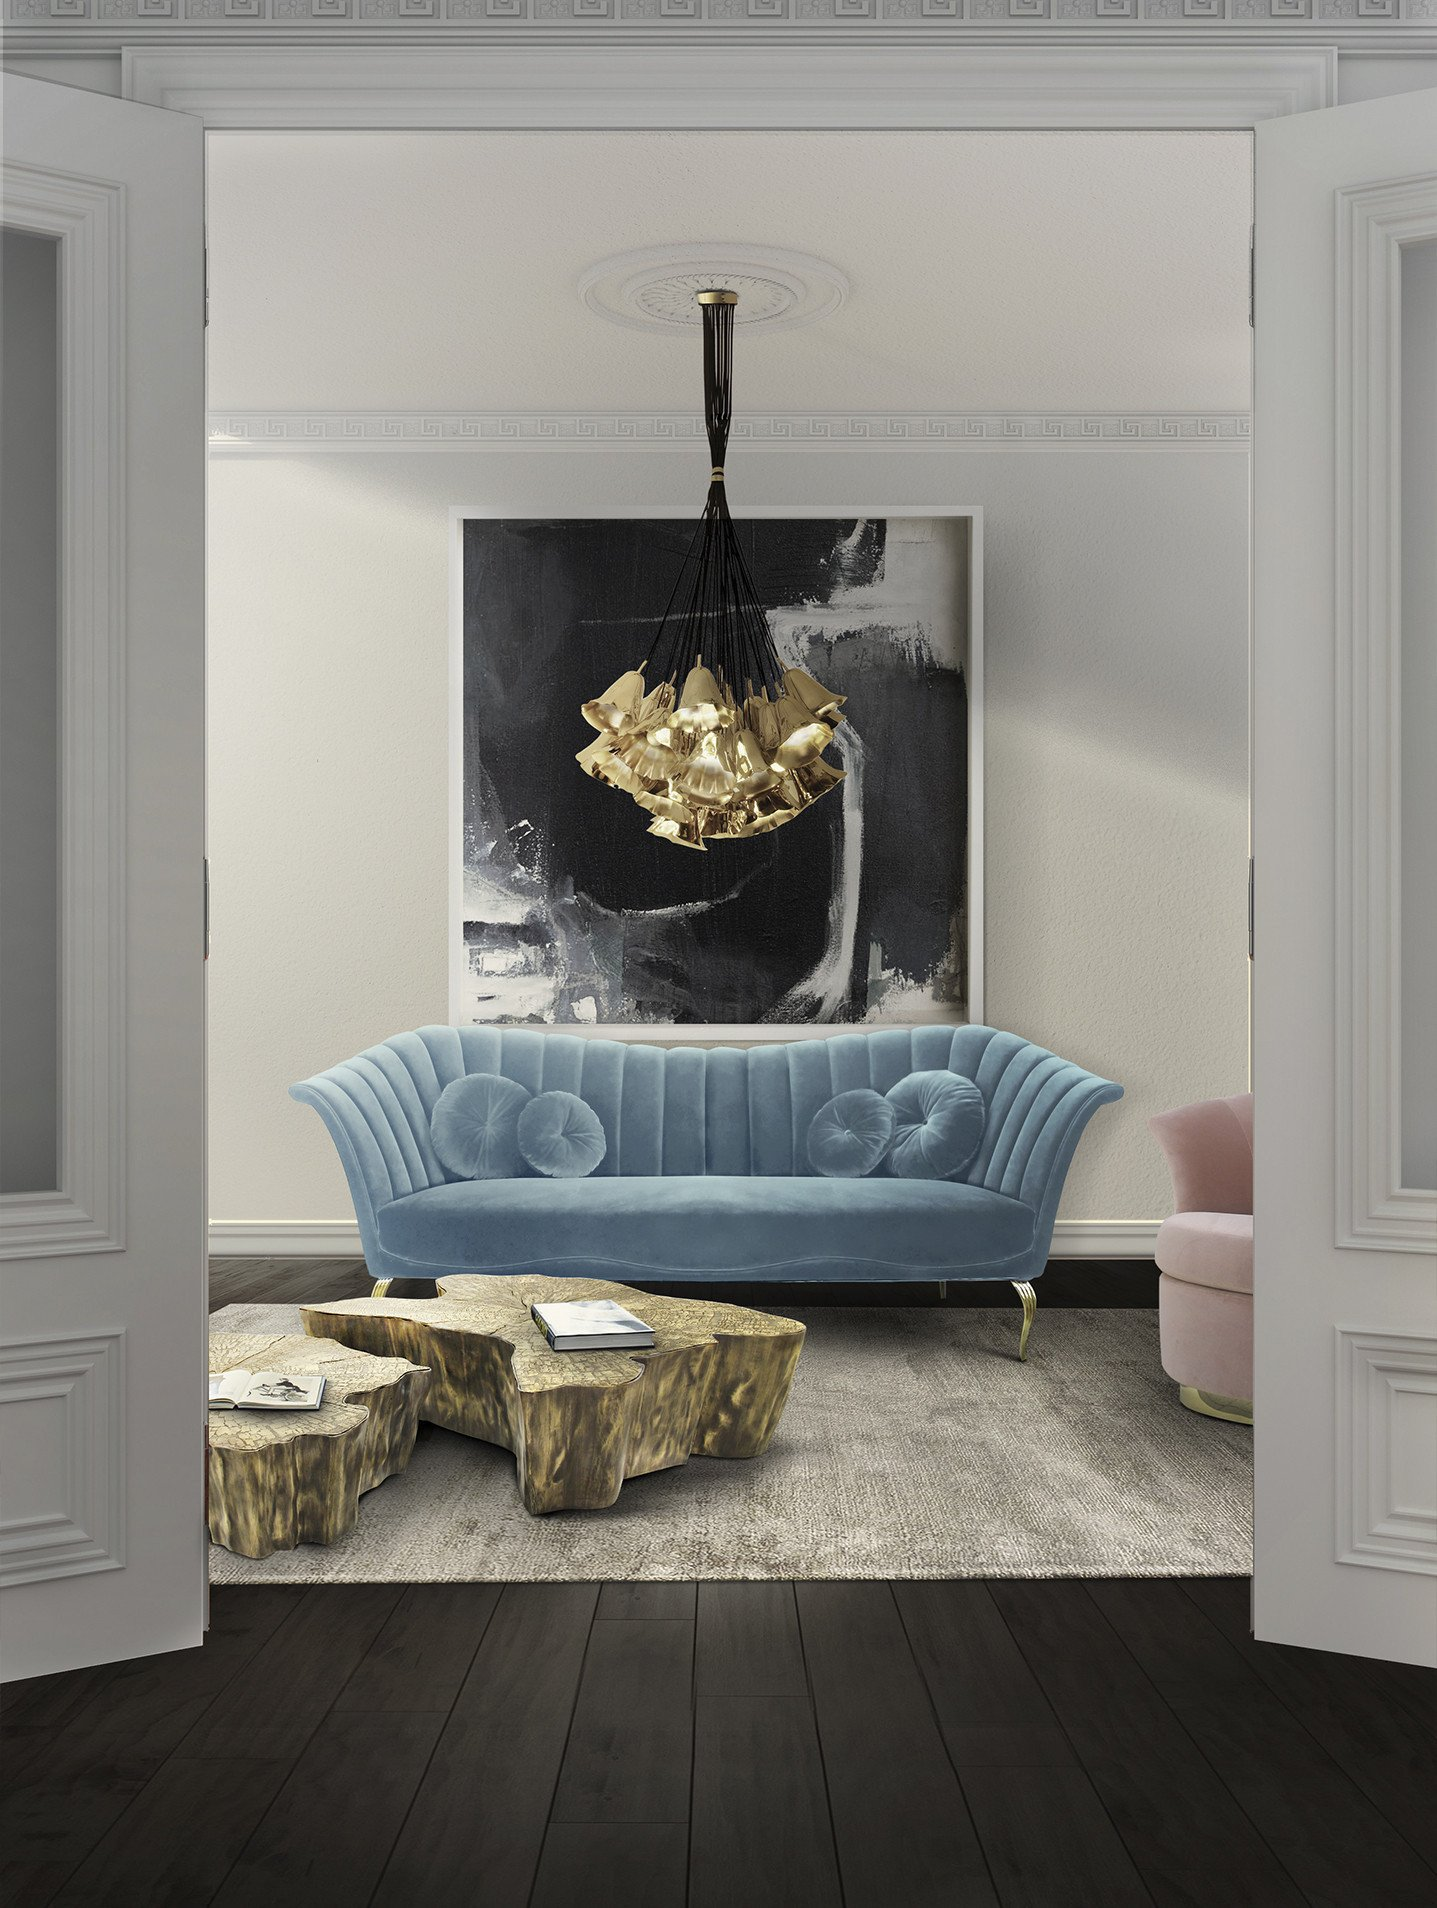 Accent Chairs for Bedroom Luxury 16 Spectacular Gray Hardwood Floors Bedroom